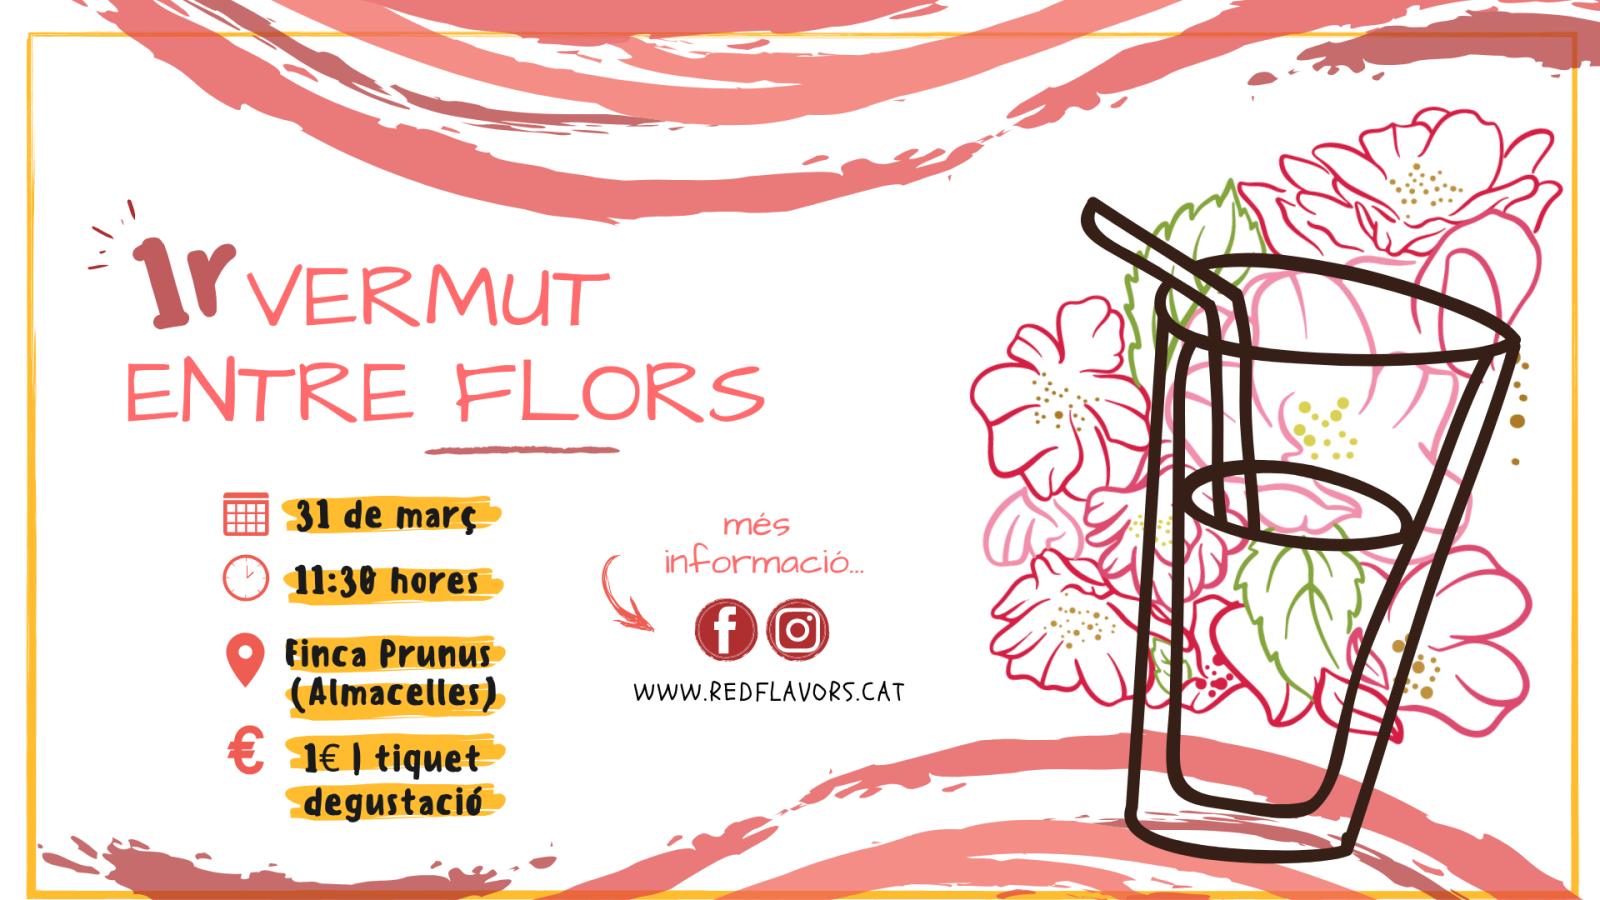 I Vermut entre flors | Finca Prun·us